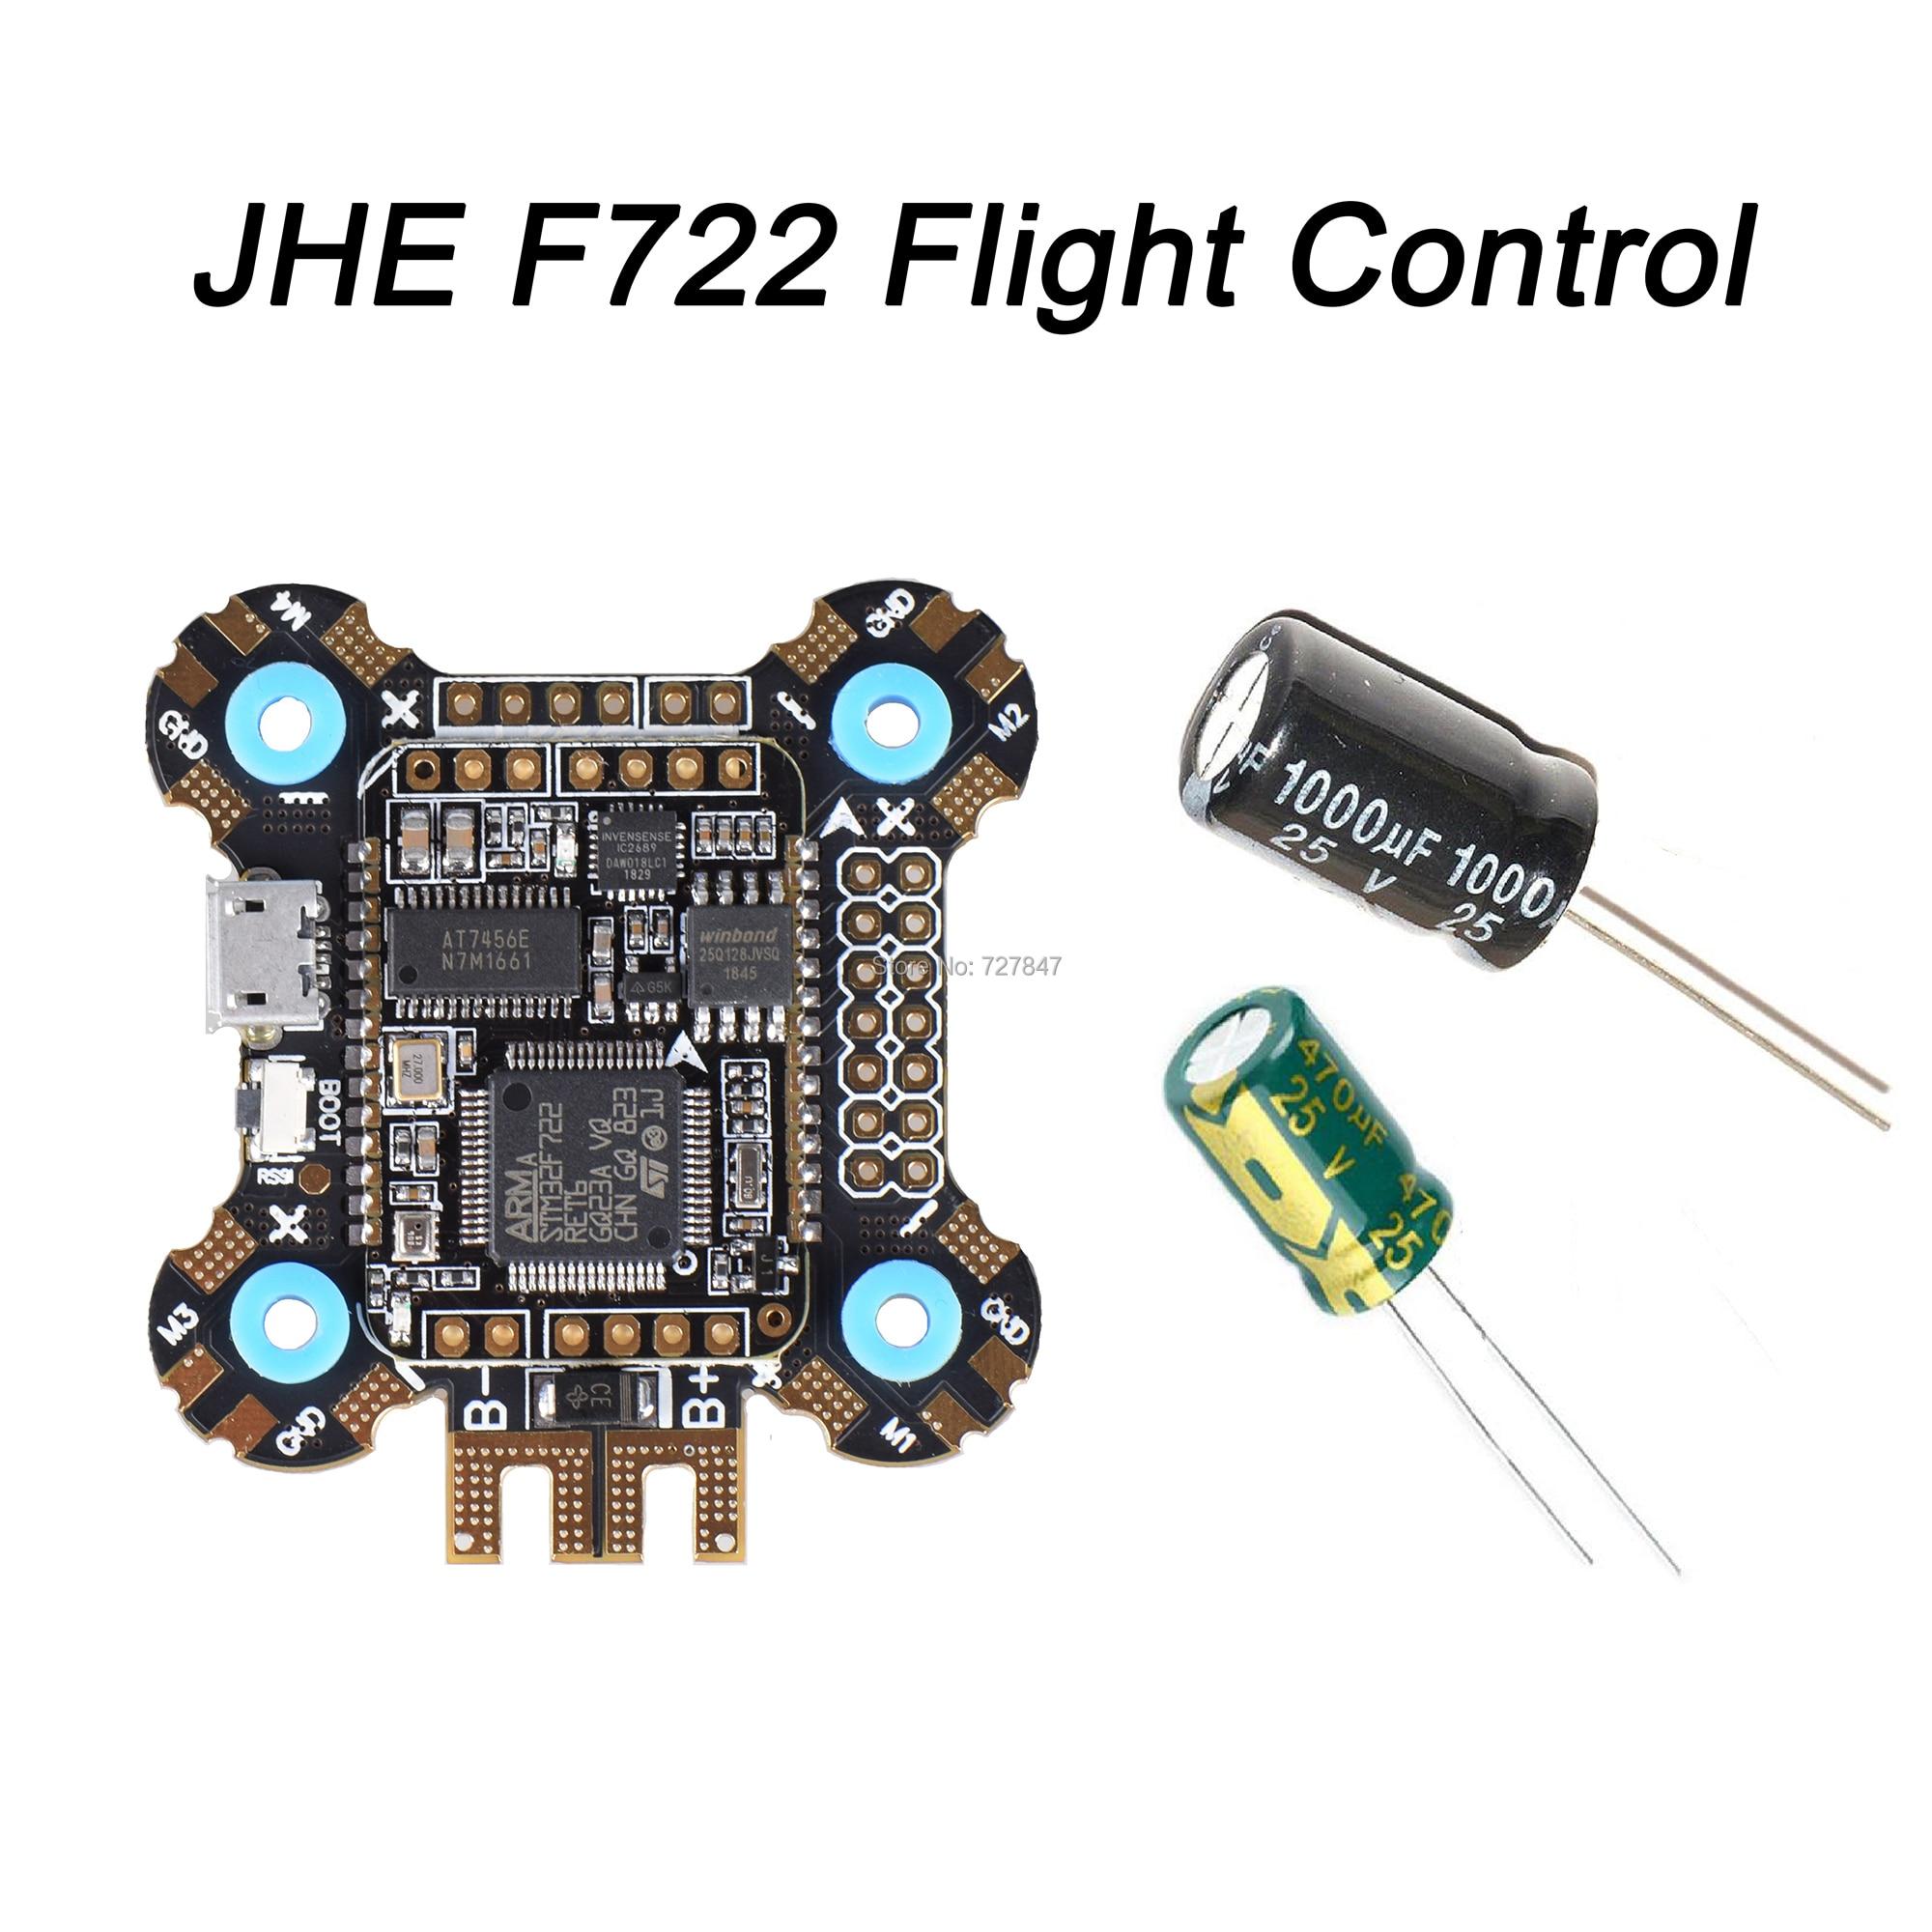 JHE F722 STM32F722 Flight Controller Built-in OSD BMP280 Barometer BEC 5V for RC Models Multicopter